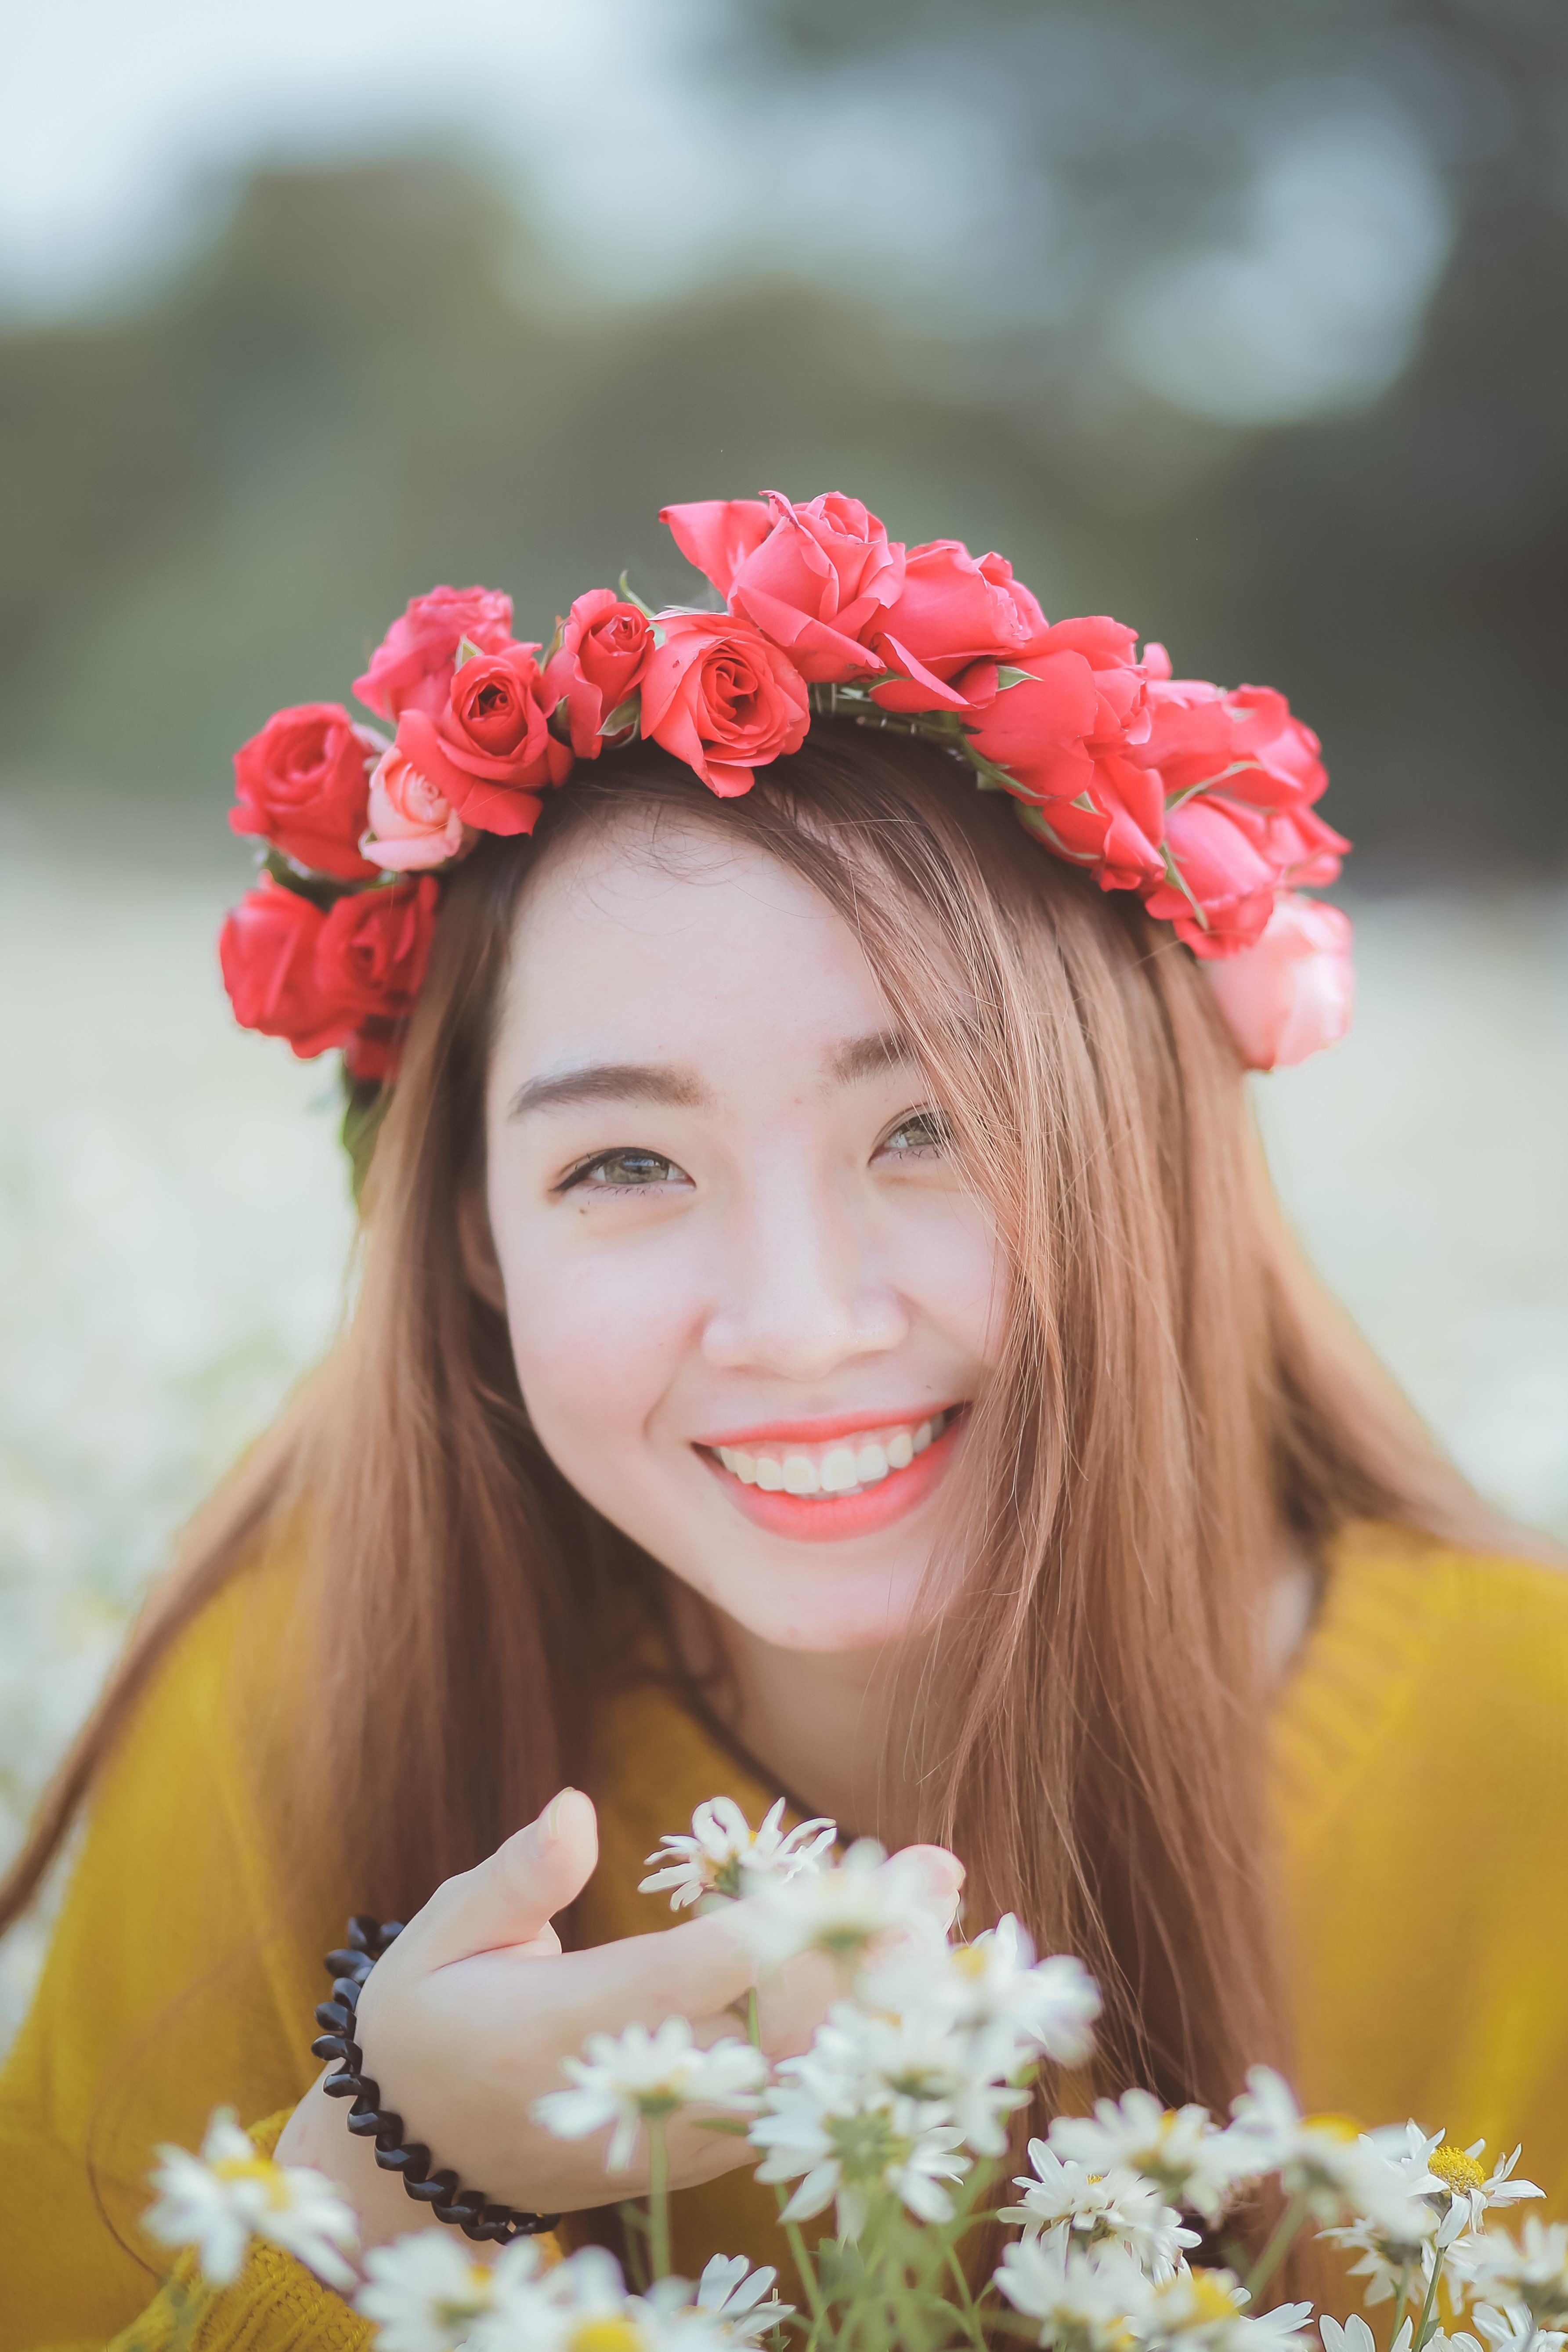 Free Images Plant Girl Woman Petal Daisy Portrait Spring